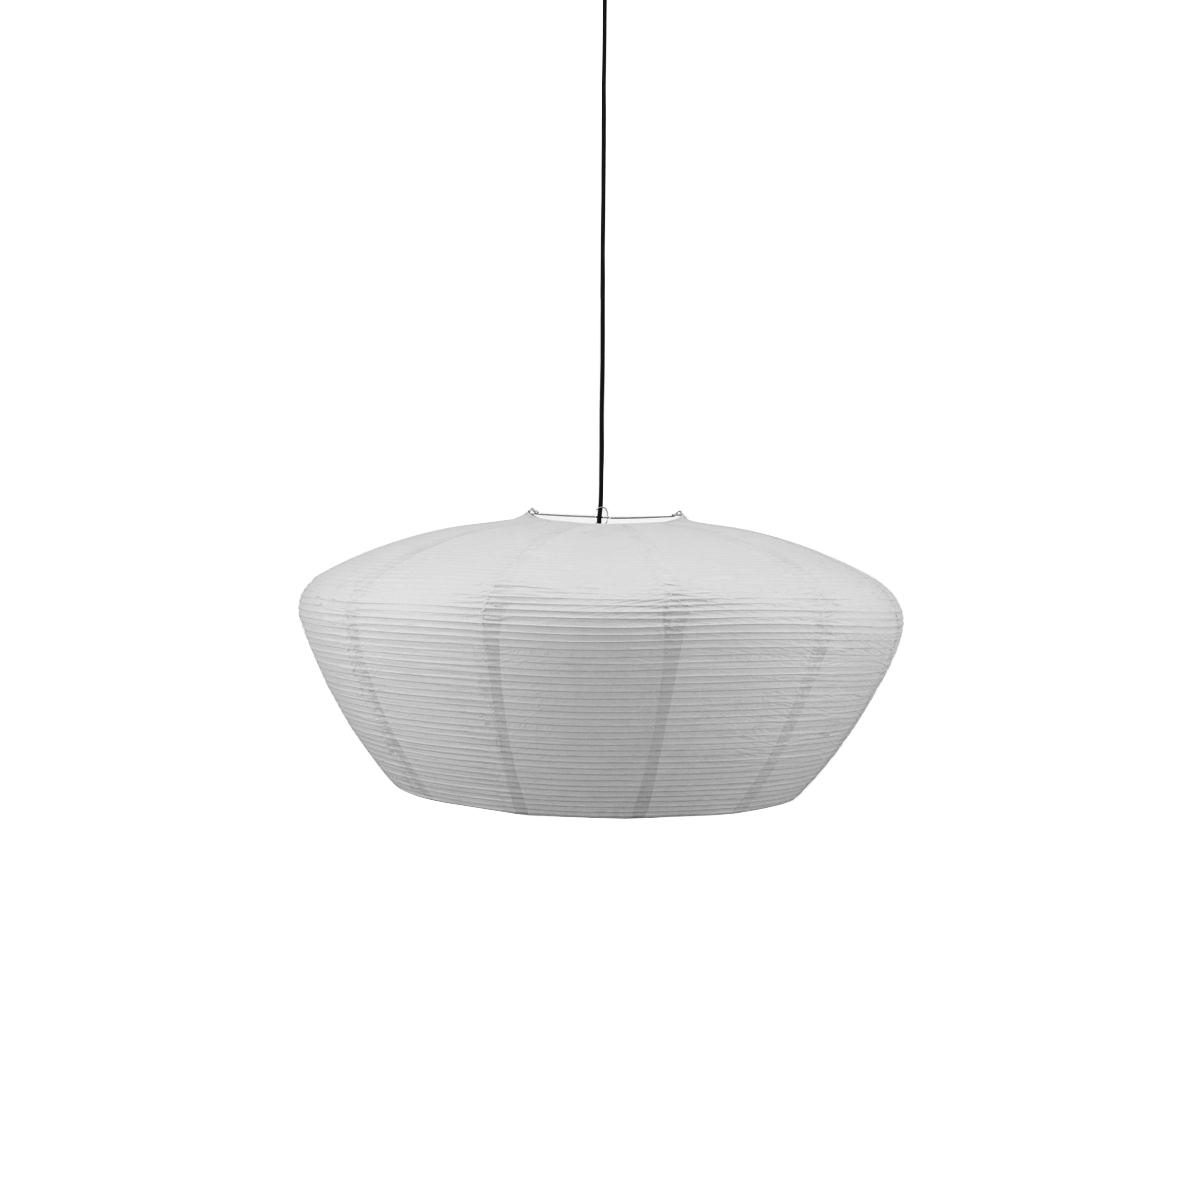 House Doctor - Bidar Lamp Shade Ø 81,5 cm - Grey (259370110)